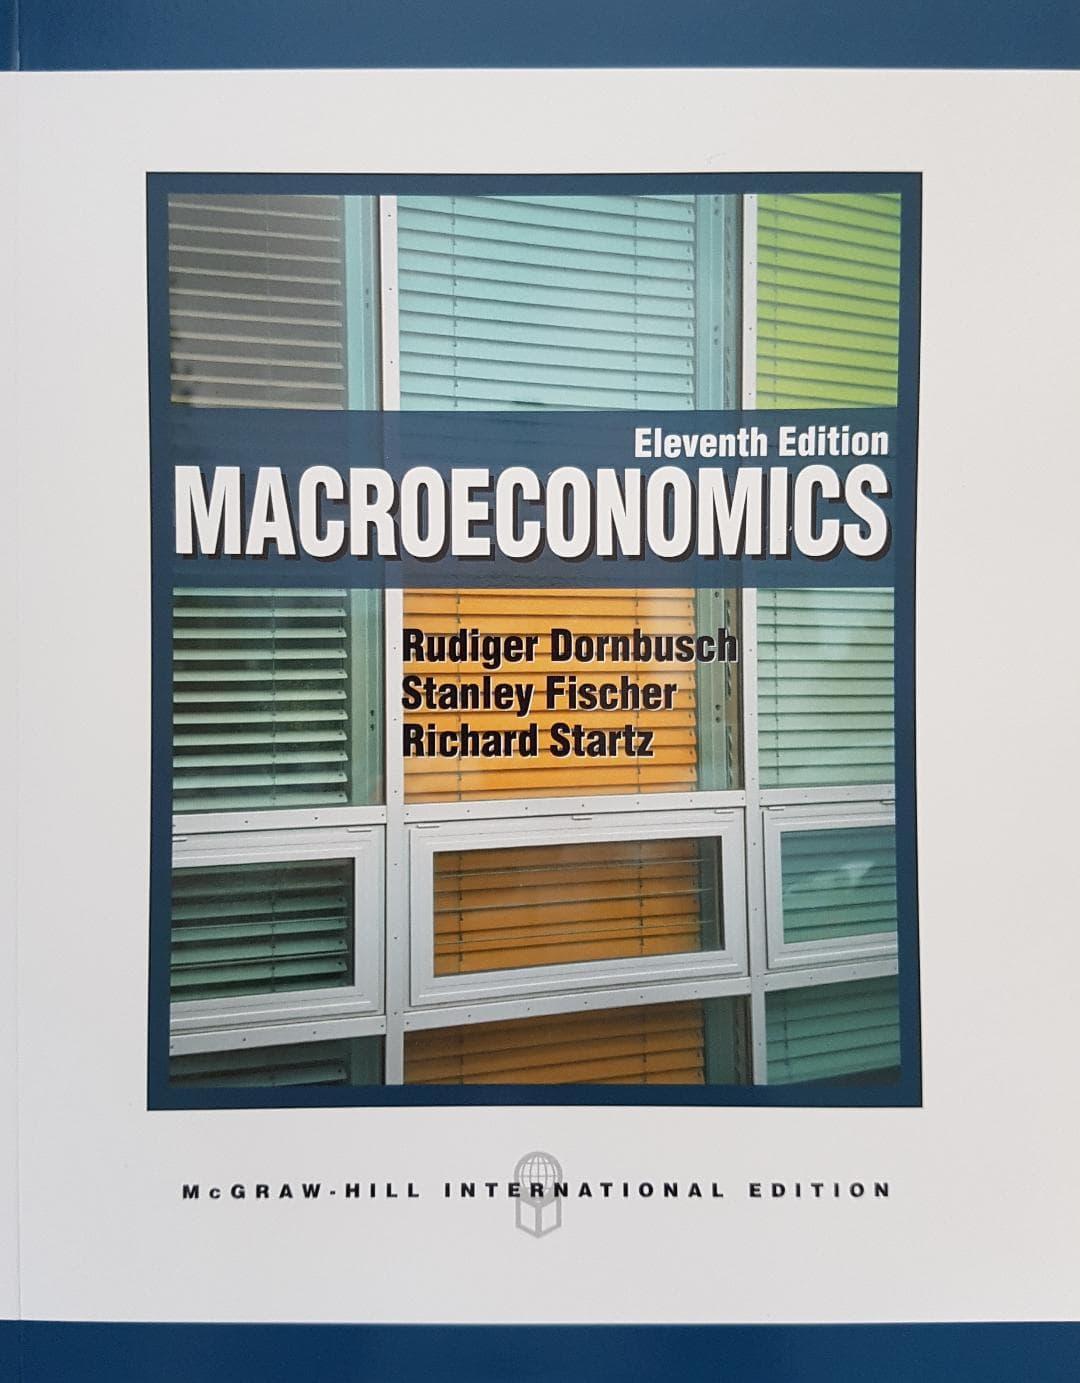 [ORIGINAL] Macroeconomics 11e - Rudiger Dornbusch